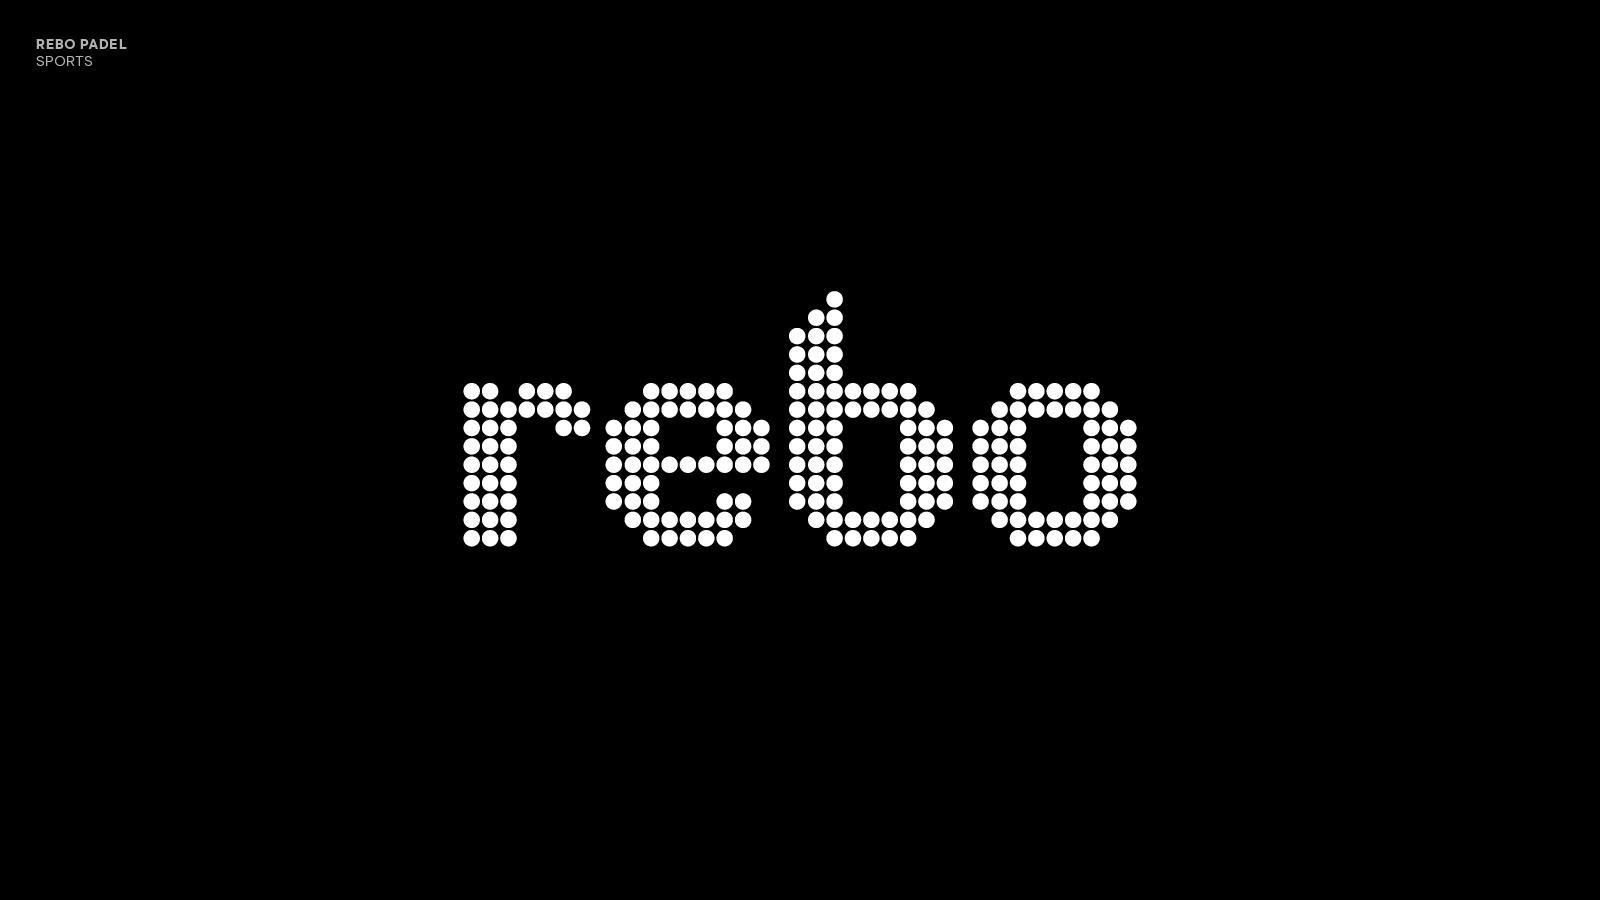 logos-designer-brand-identity-projects-graphics-studio-milton-keynes-london-12